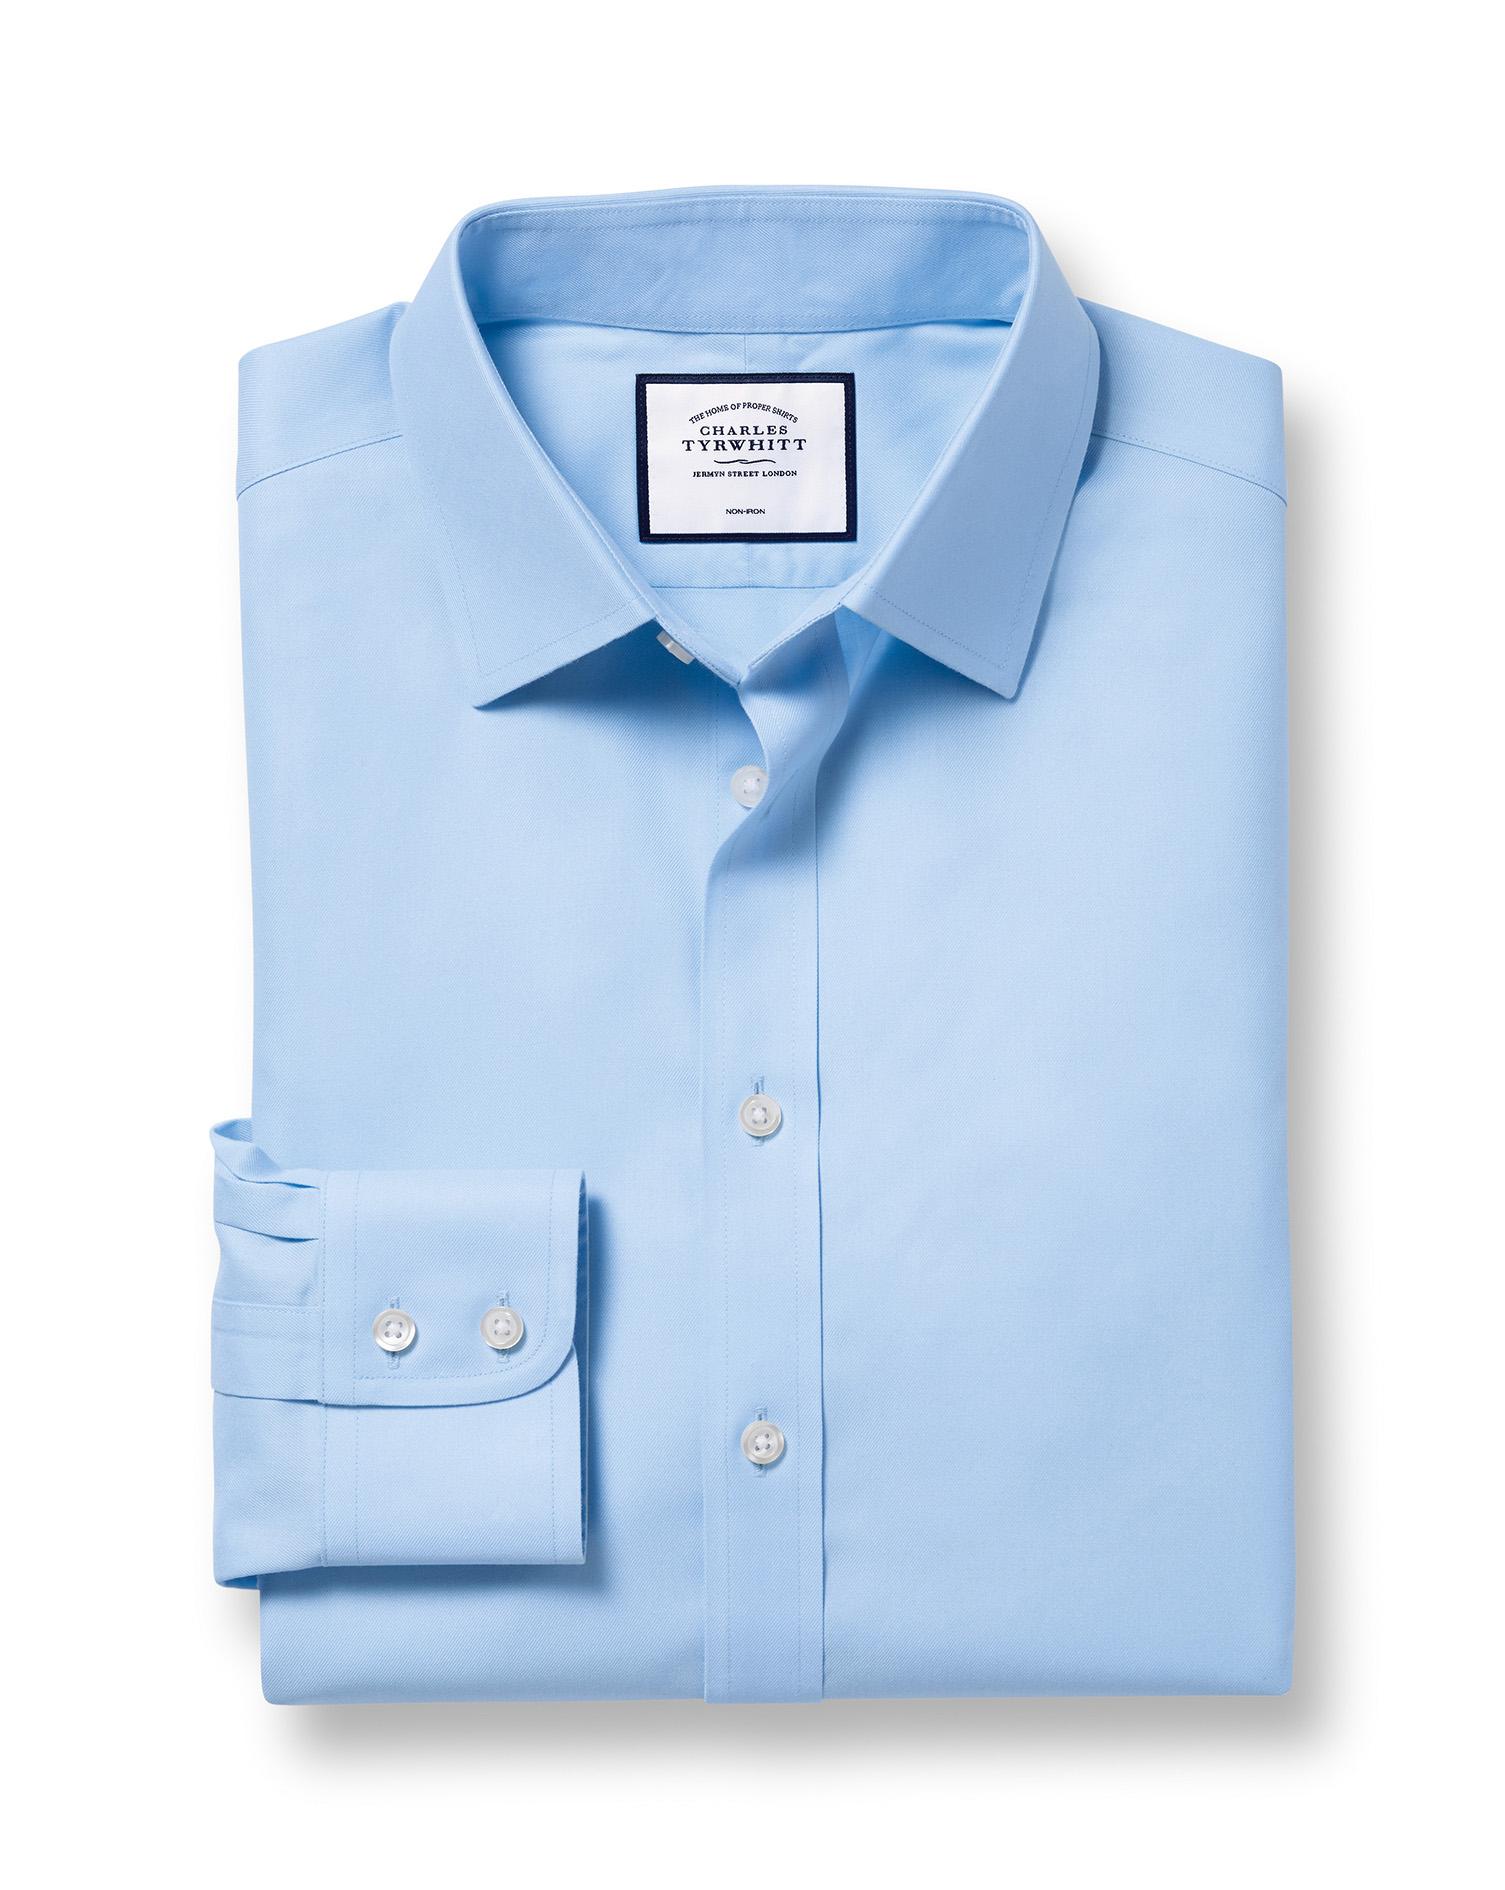 Slim Fit Non-Iron Twill Sky Blue Cotton Formal Shirt Single Cuff Size 16/36 by Charles Tyrwhitt